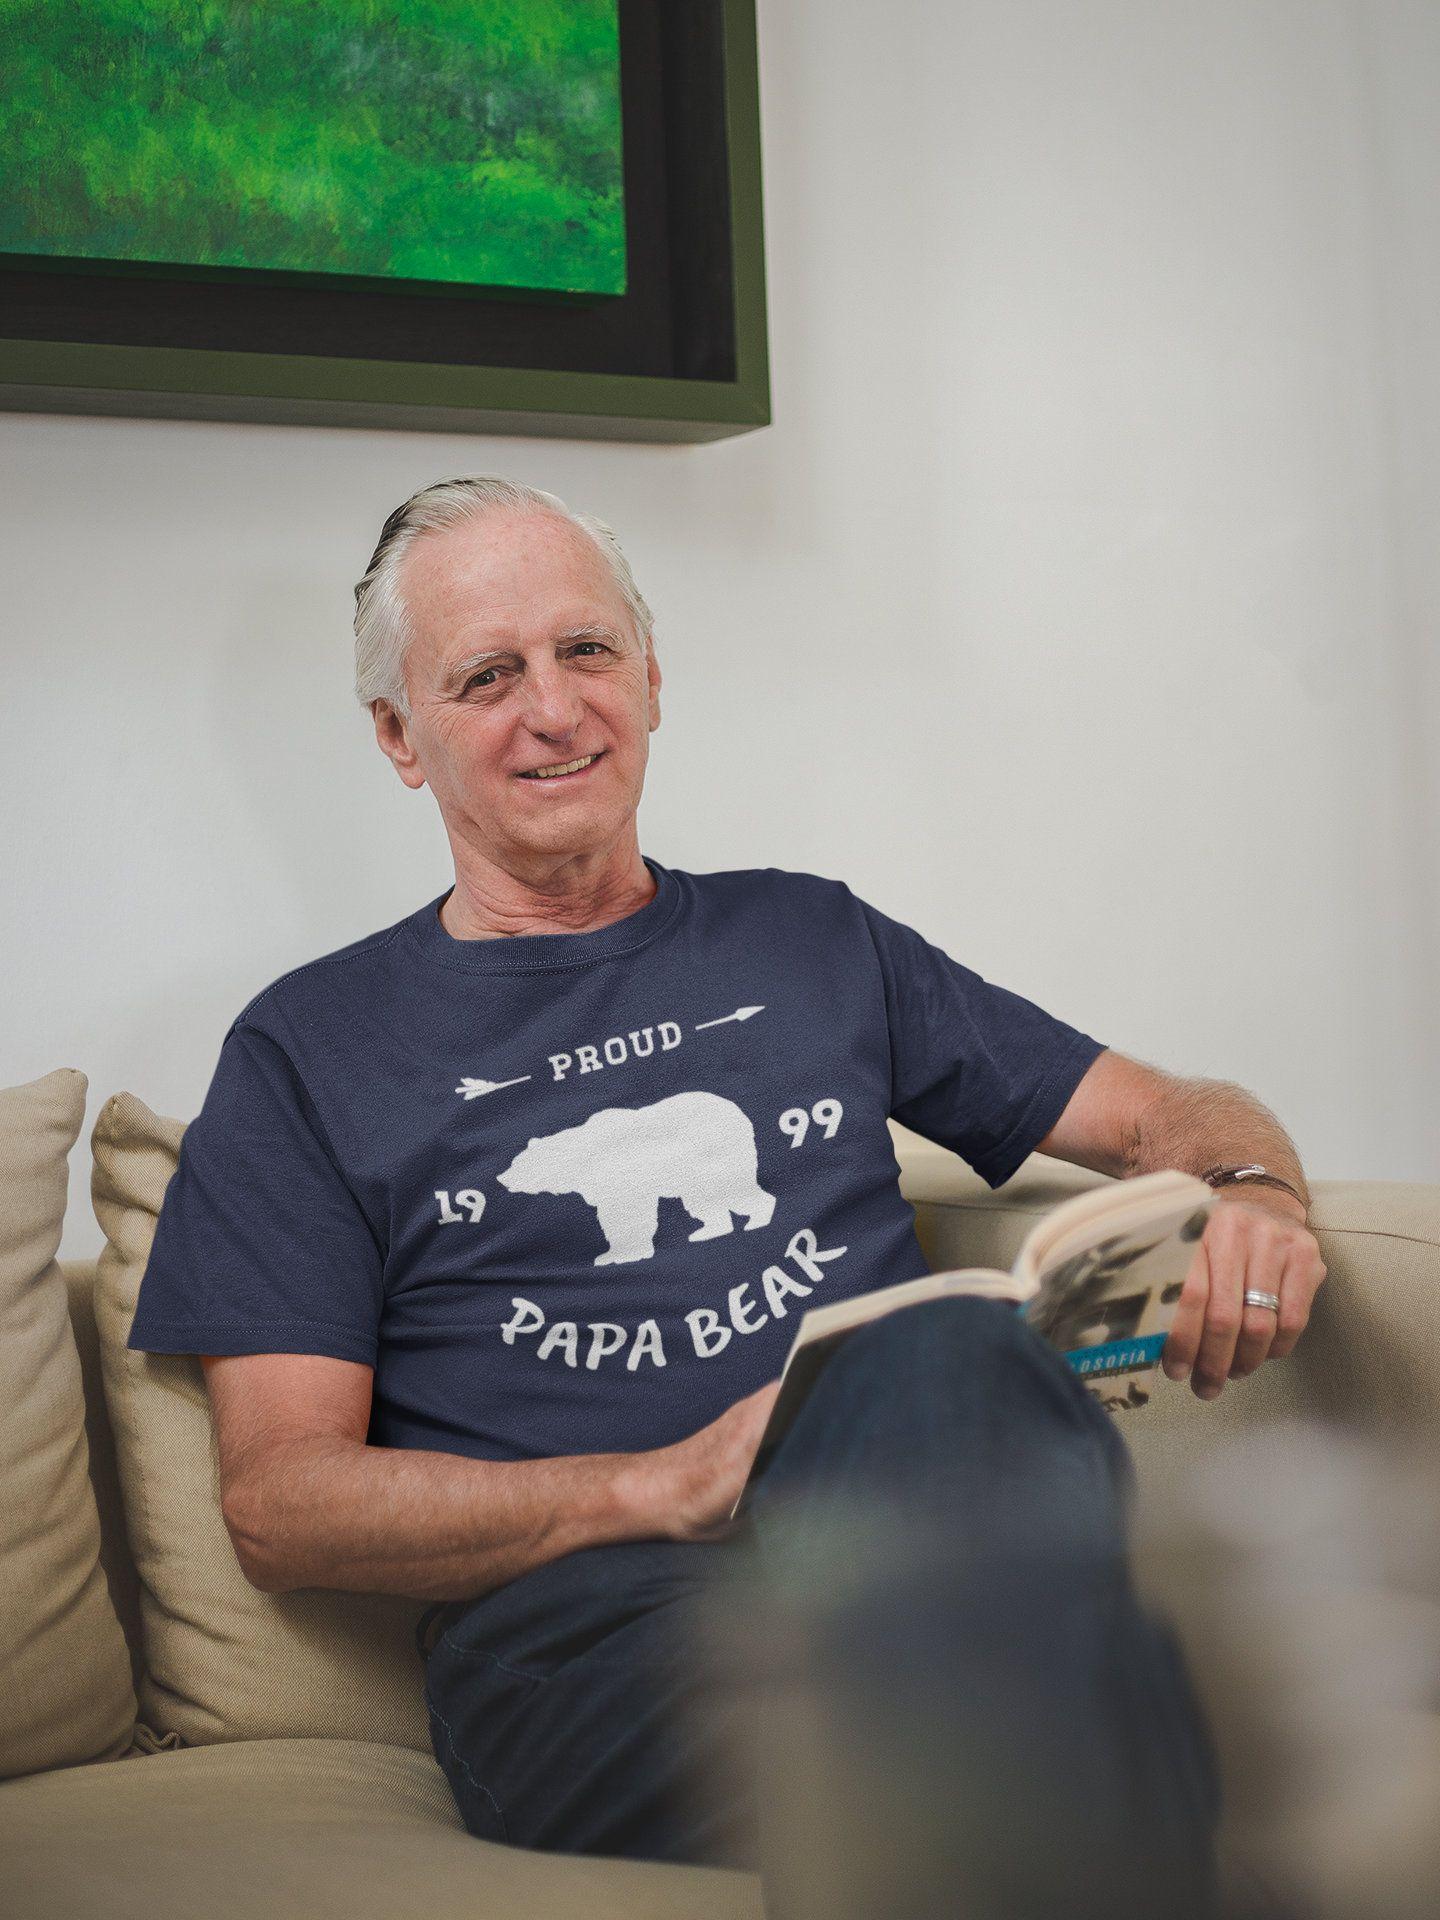 Men's Personalized Papa Gift EST. T-Shirt Proud Papa Bear Grandpa Gift Father's Day Shirts Papa Shirt Grandpa TShirt #papashirts